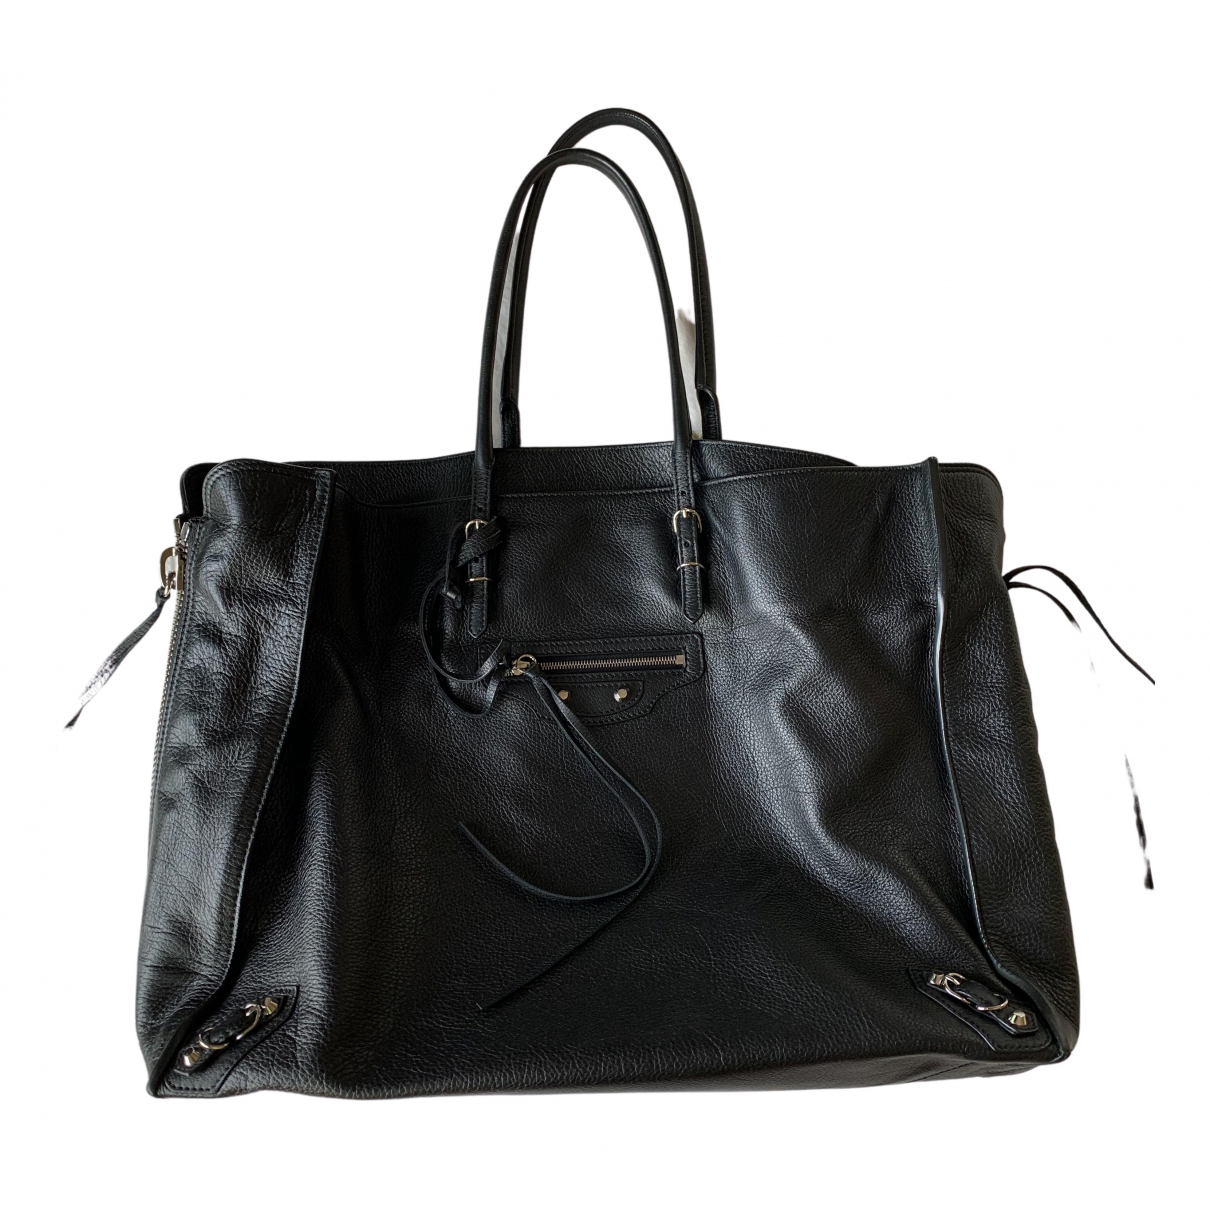 Balenciaga Papier Handtasche in  Schwarz Leder